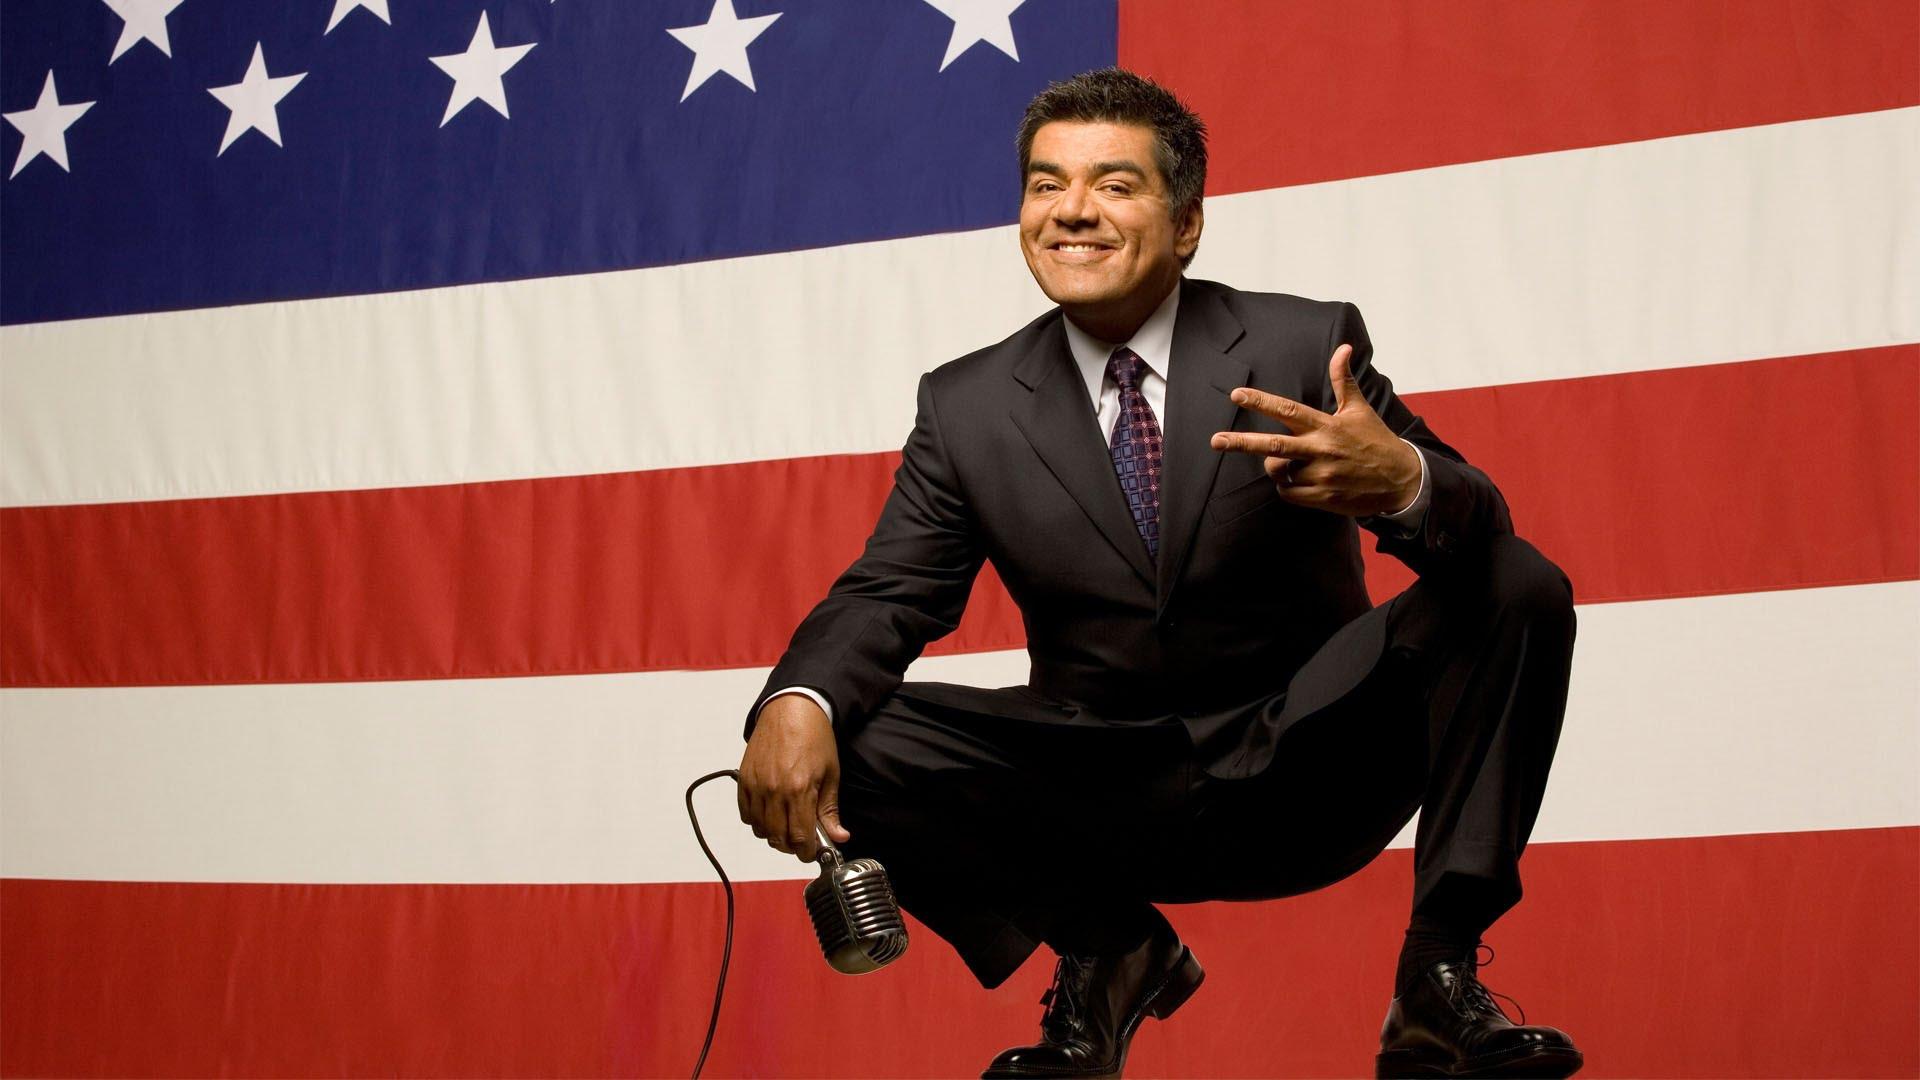 Watch George Lopez Parody 'SNL' As Donaldo Trumpez